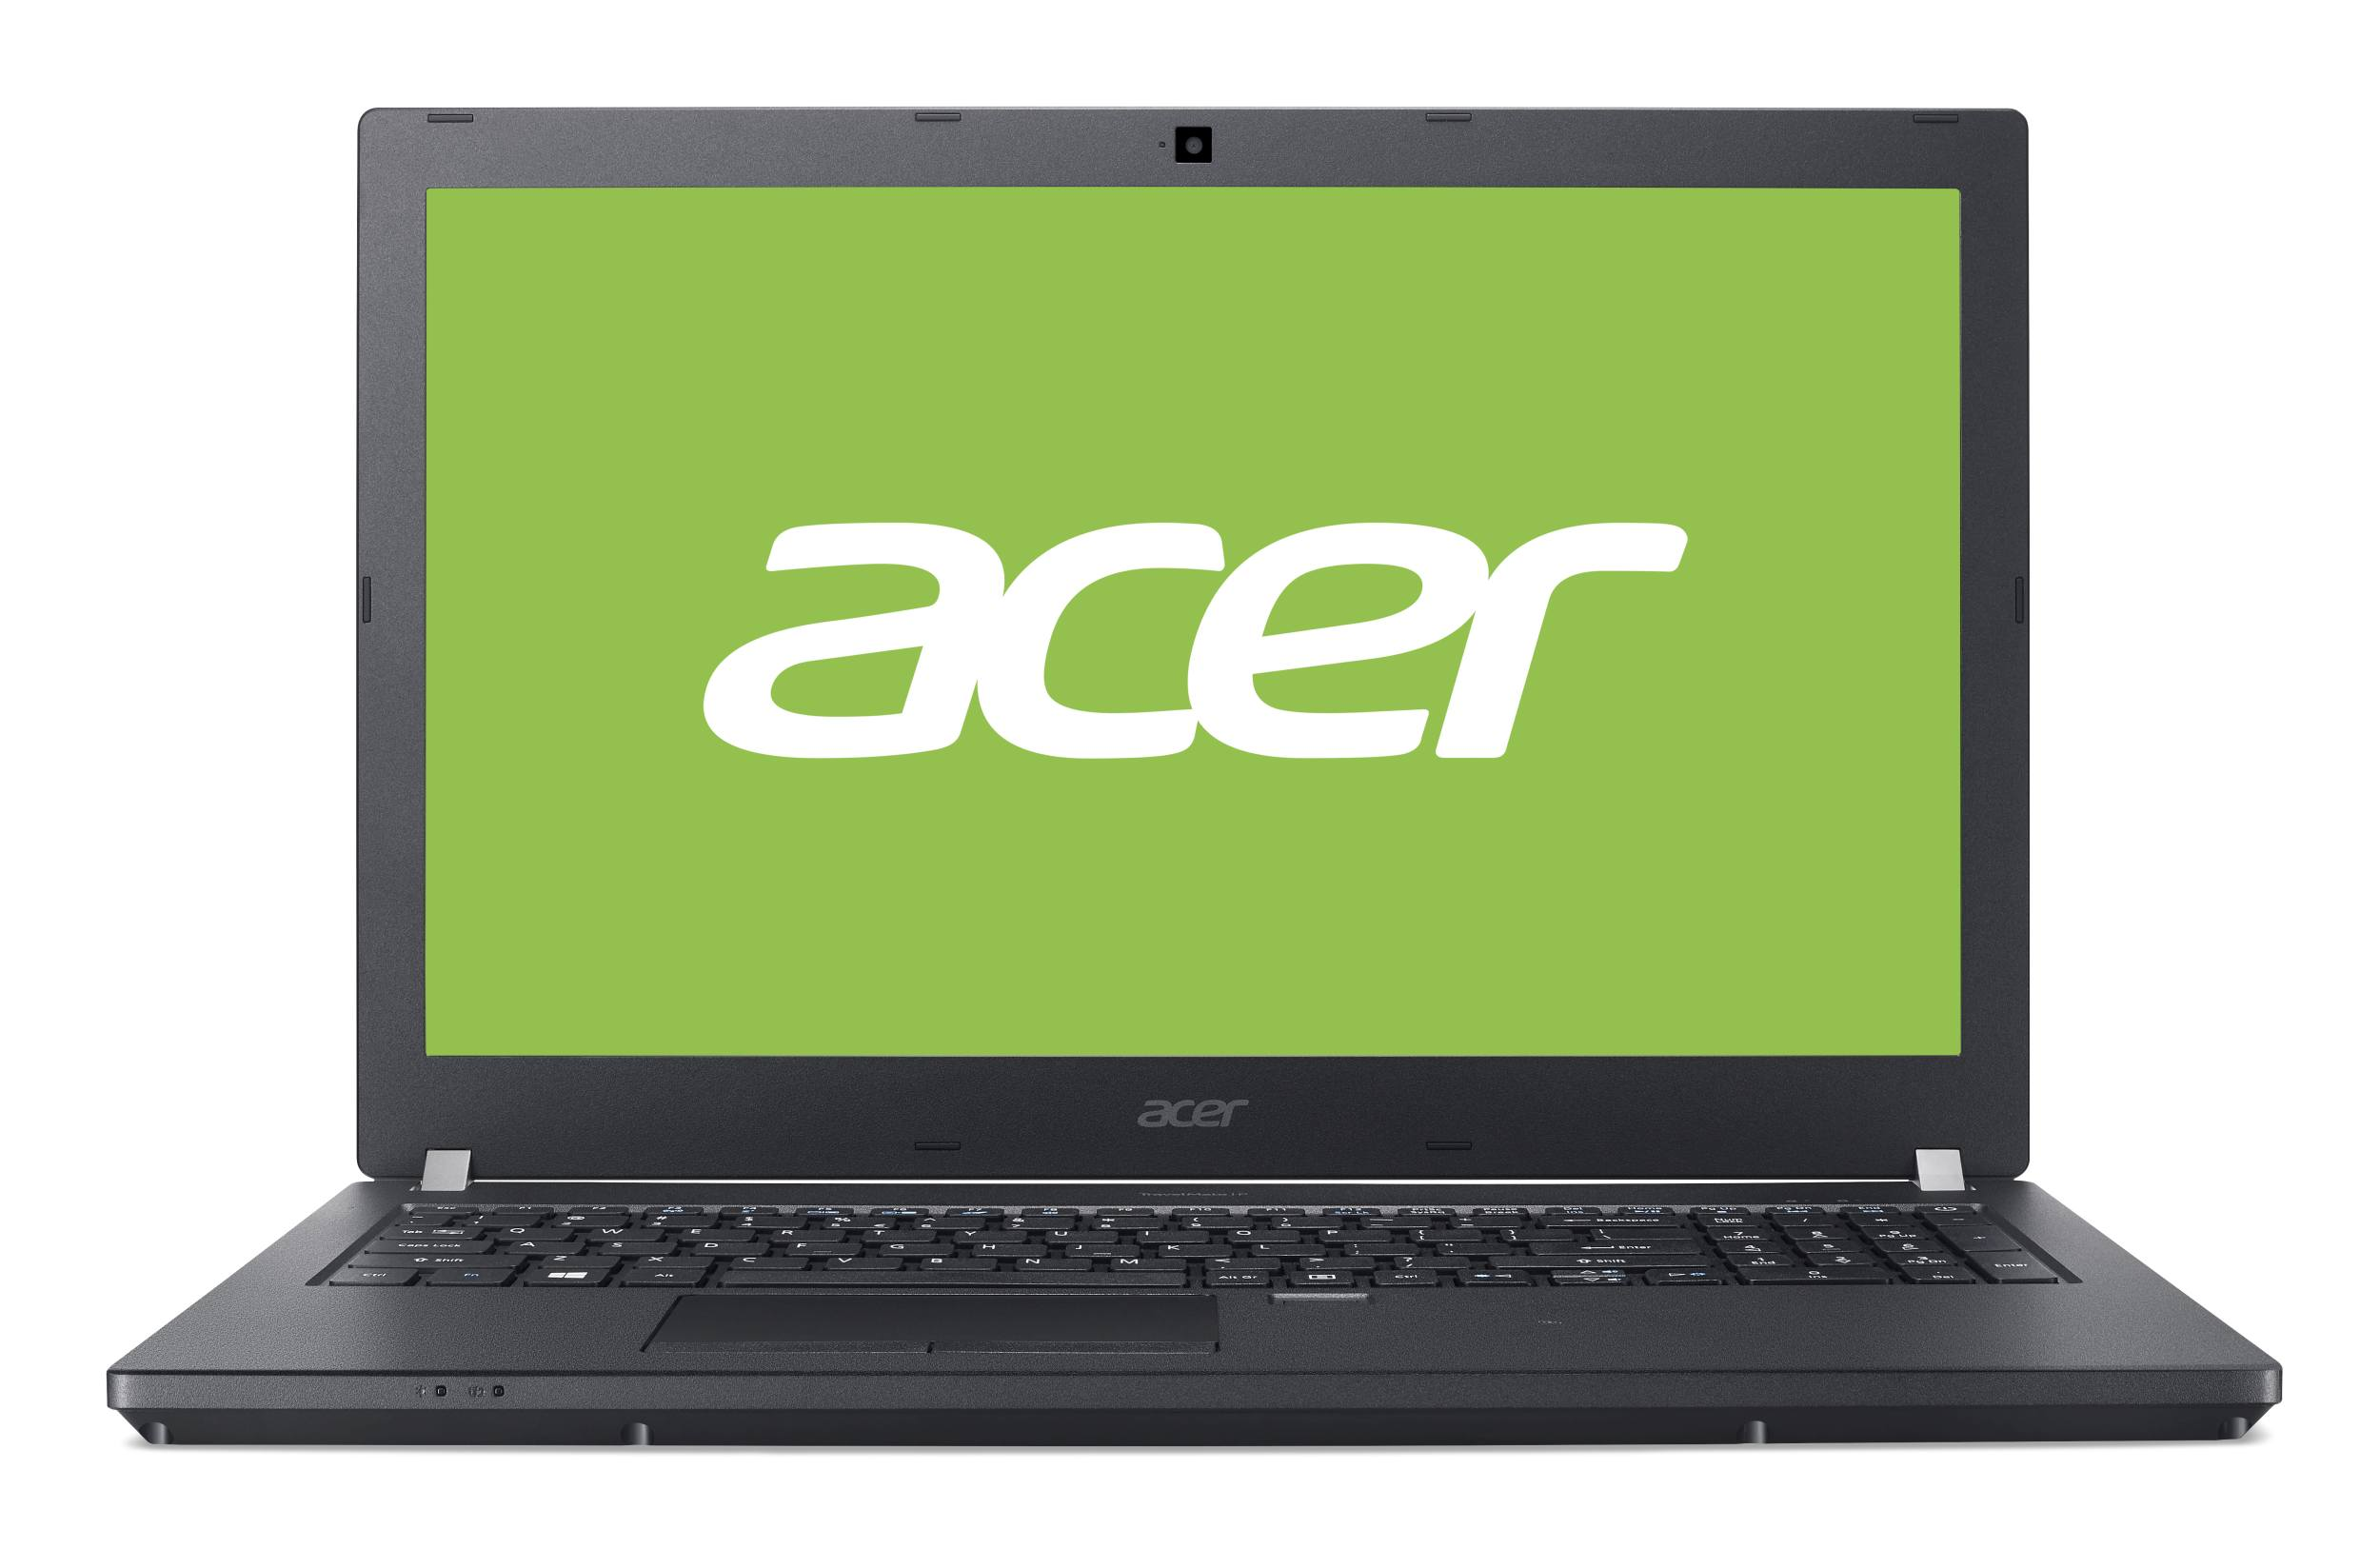 "AcerTravelMate TMP459-G2-MG-5135 i5-7200U/8GB+N/256GB PCIe SSD+N/GeForce 940MX 2GB/15.6"" FHD matný IPS LED/BT/W10 Pro/Black"